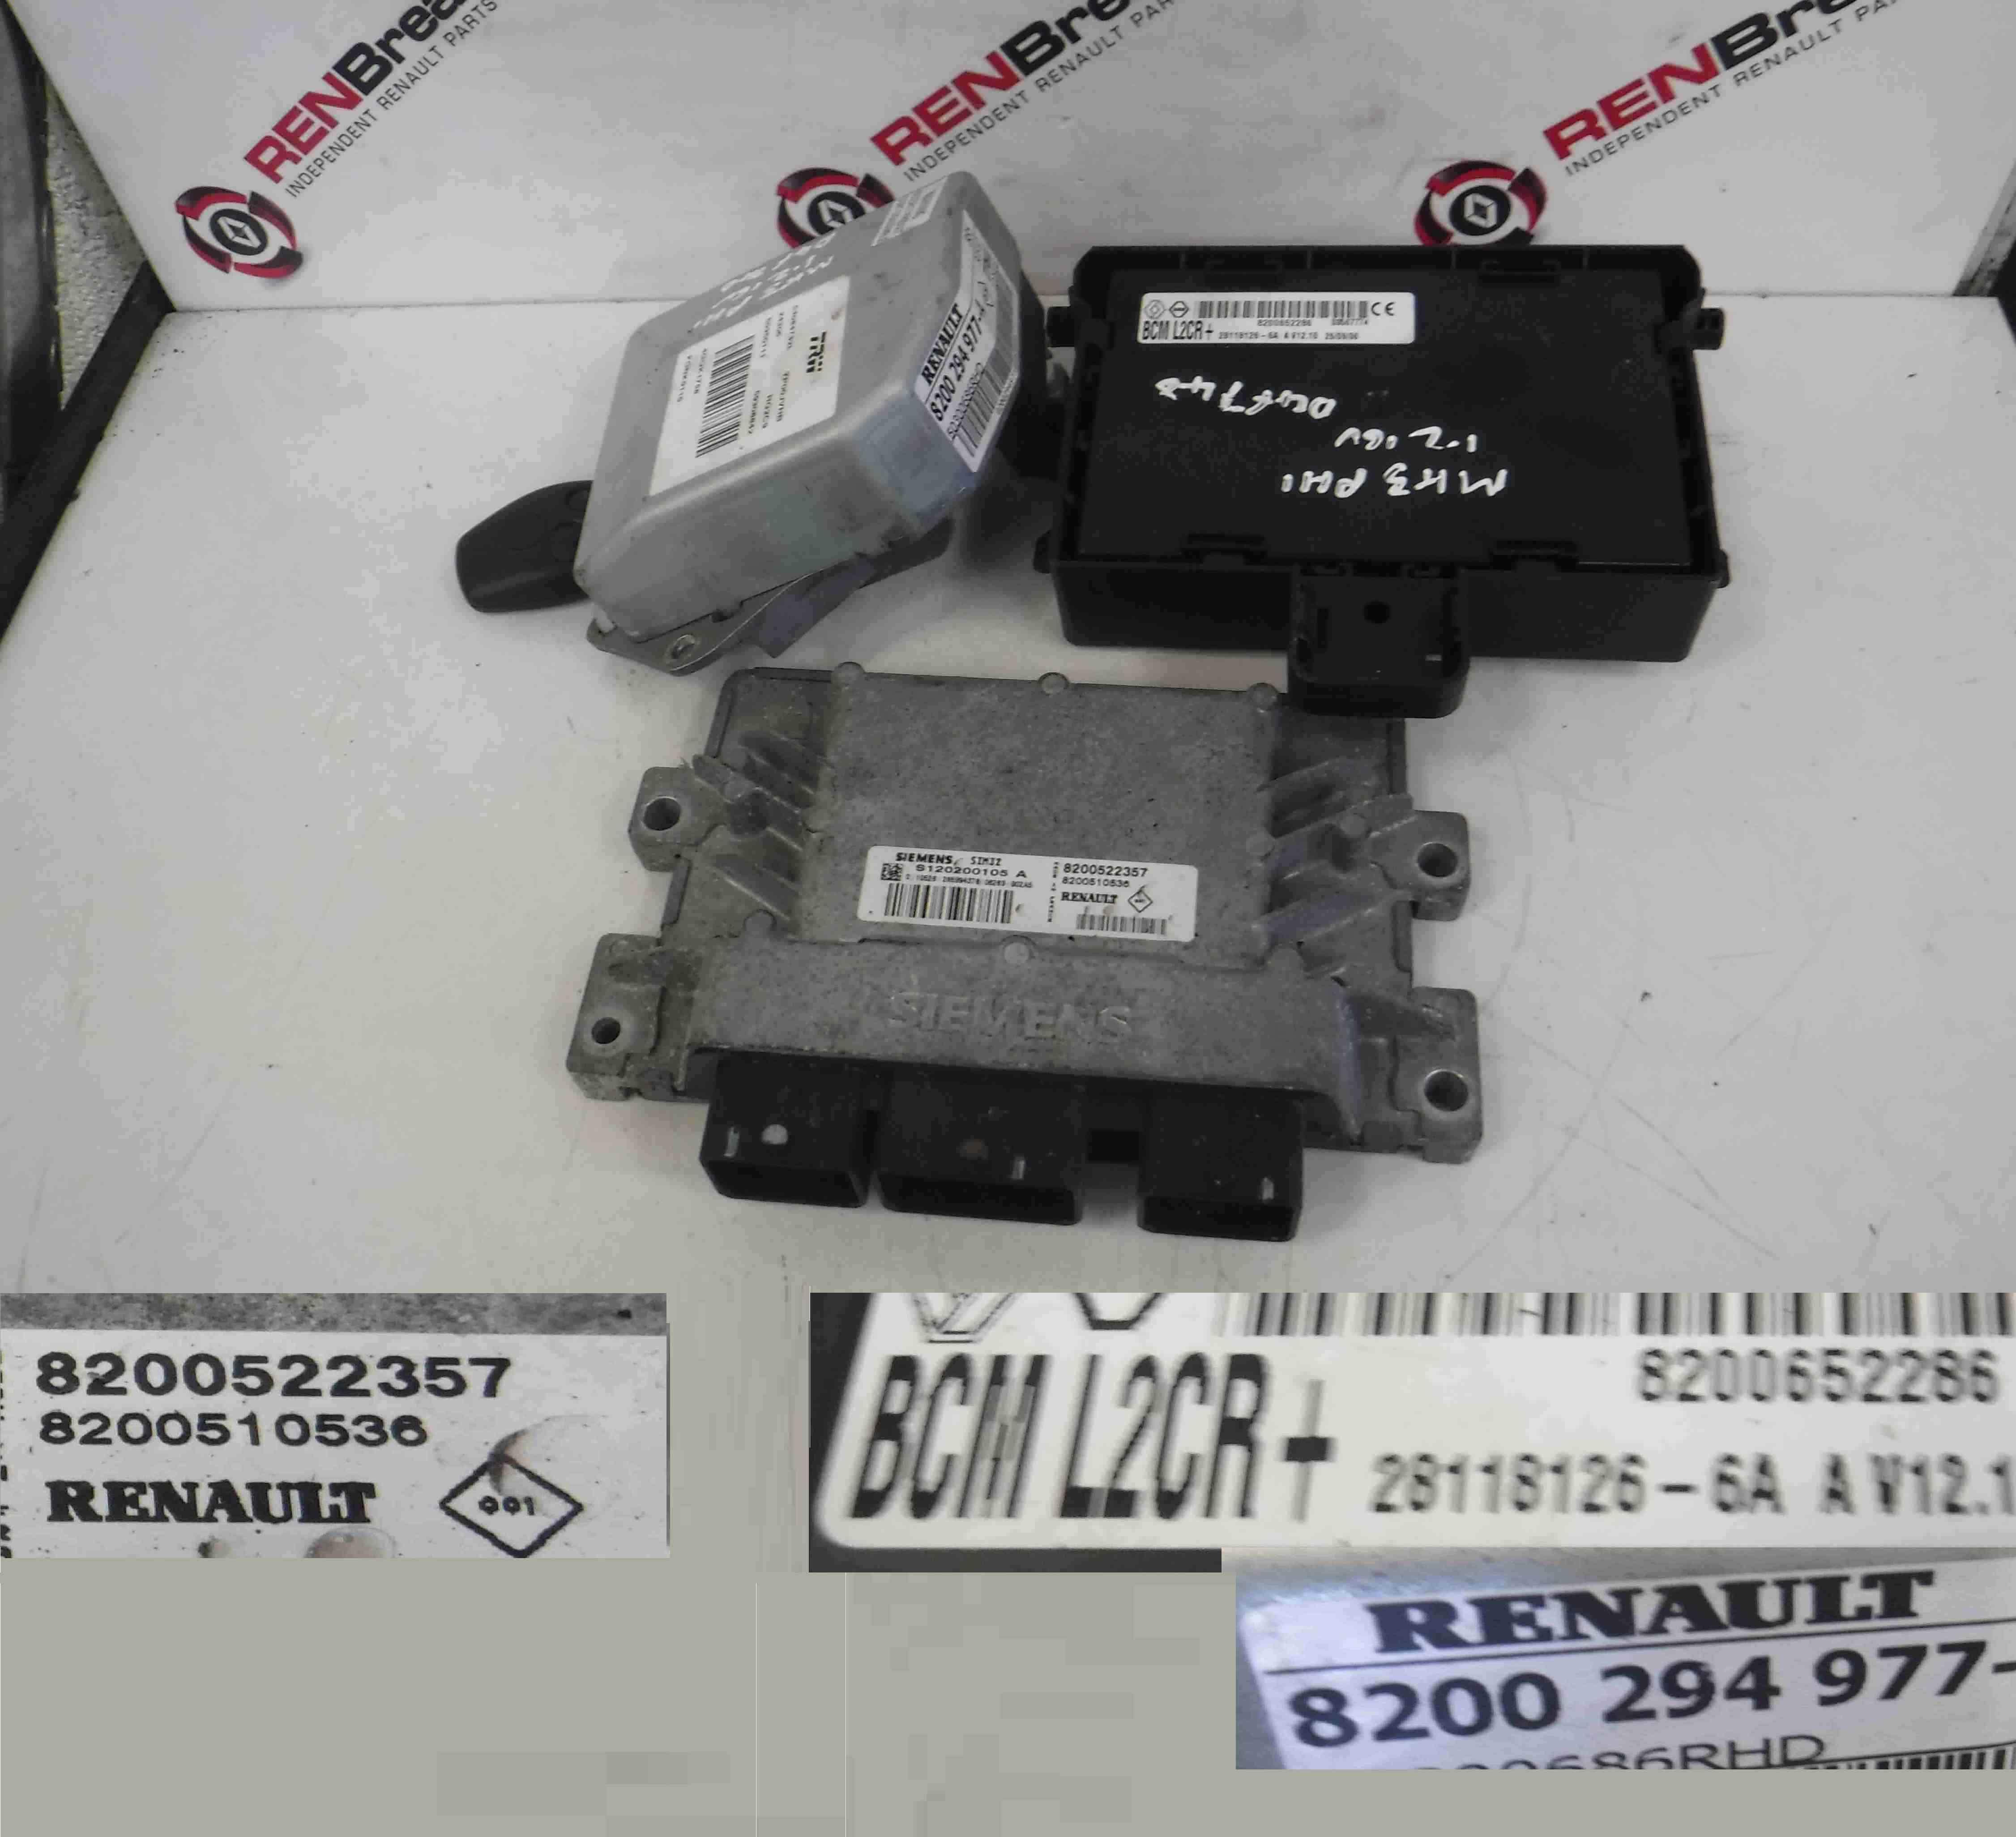 Renault Clio Mk3 2005 2012 12 16v Ecu Set Uch Steering Key Fuse Box Fob 8200522357